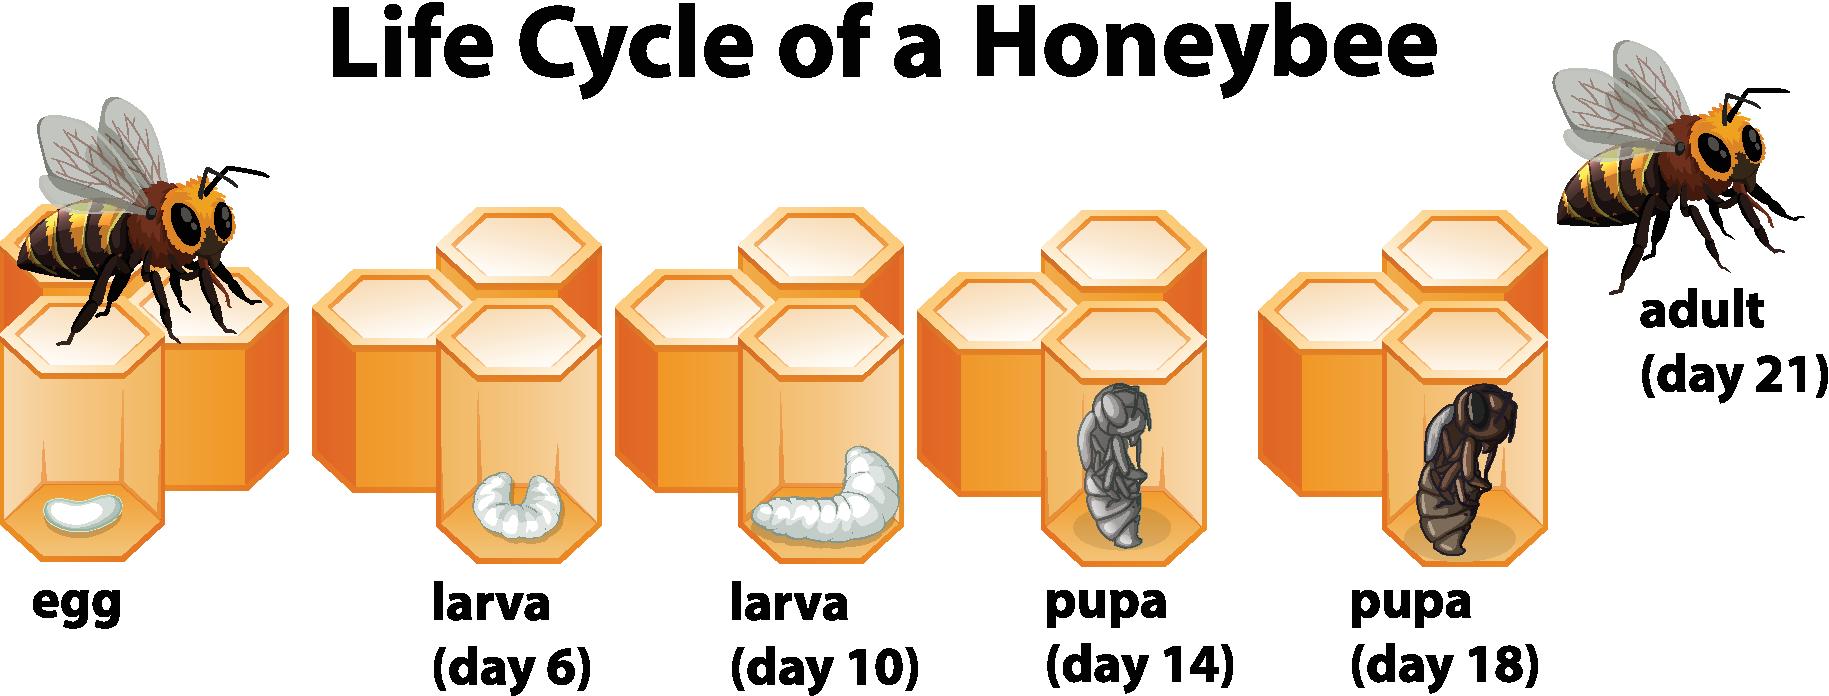 honeybee-lifecycle.png